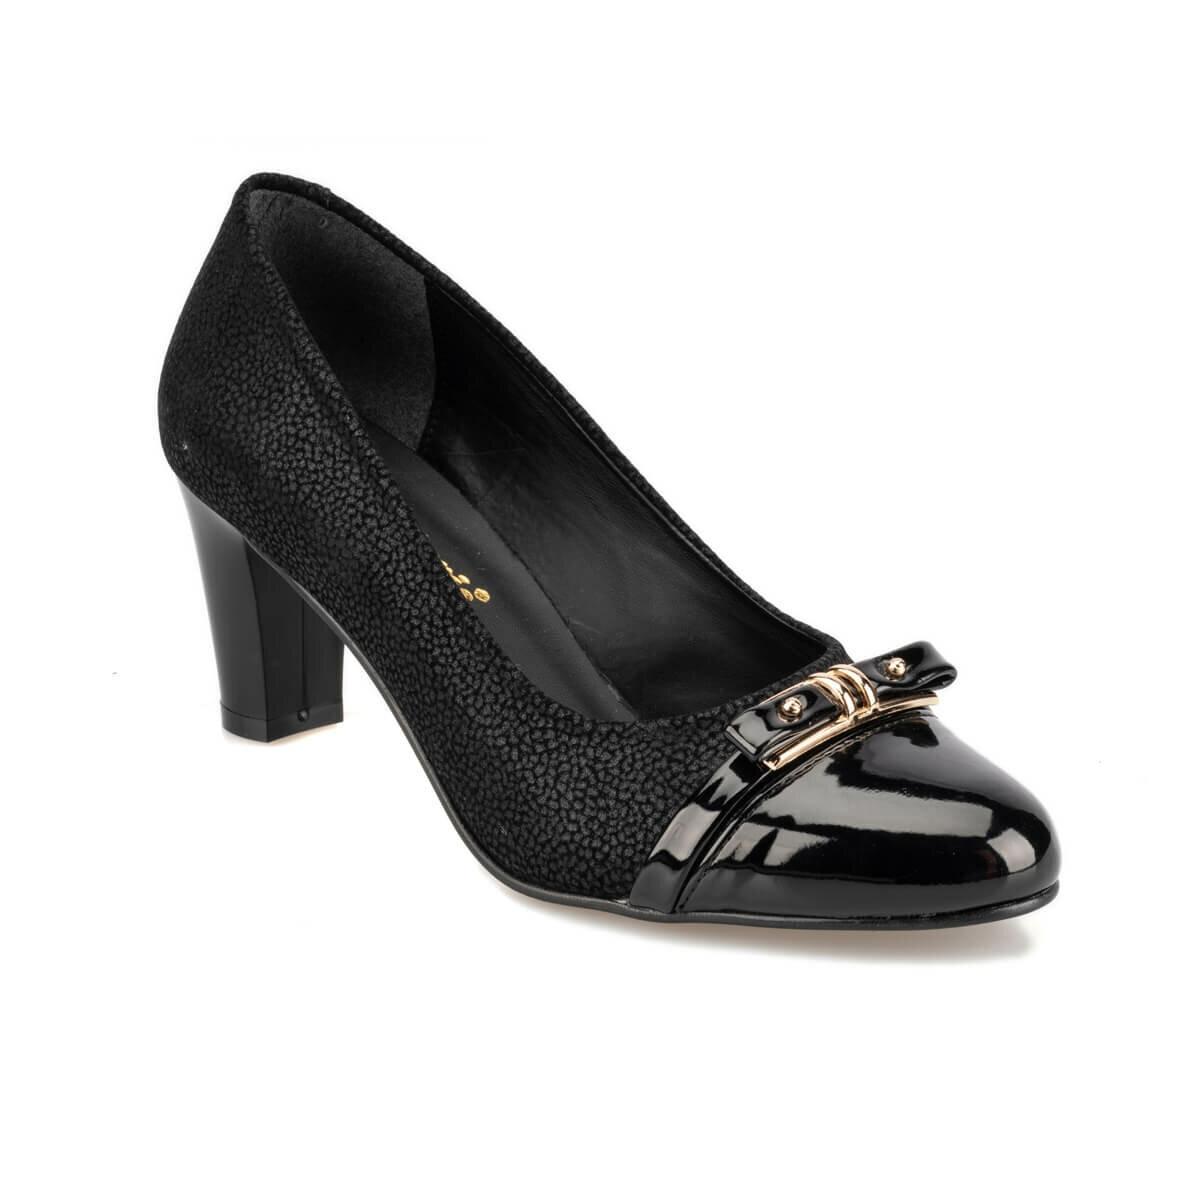 FLO 92.314082.Z Black Women Gova Shoes Polaris